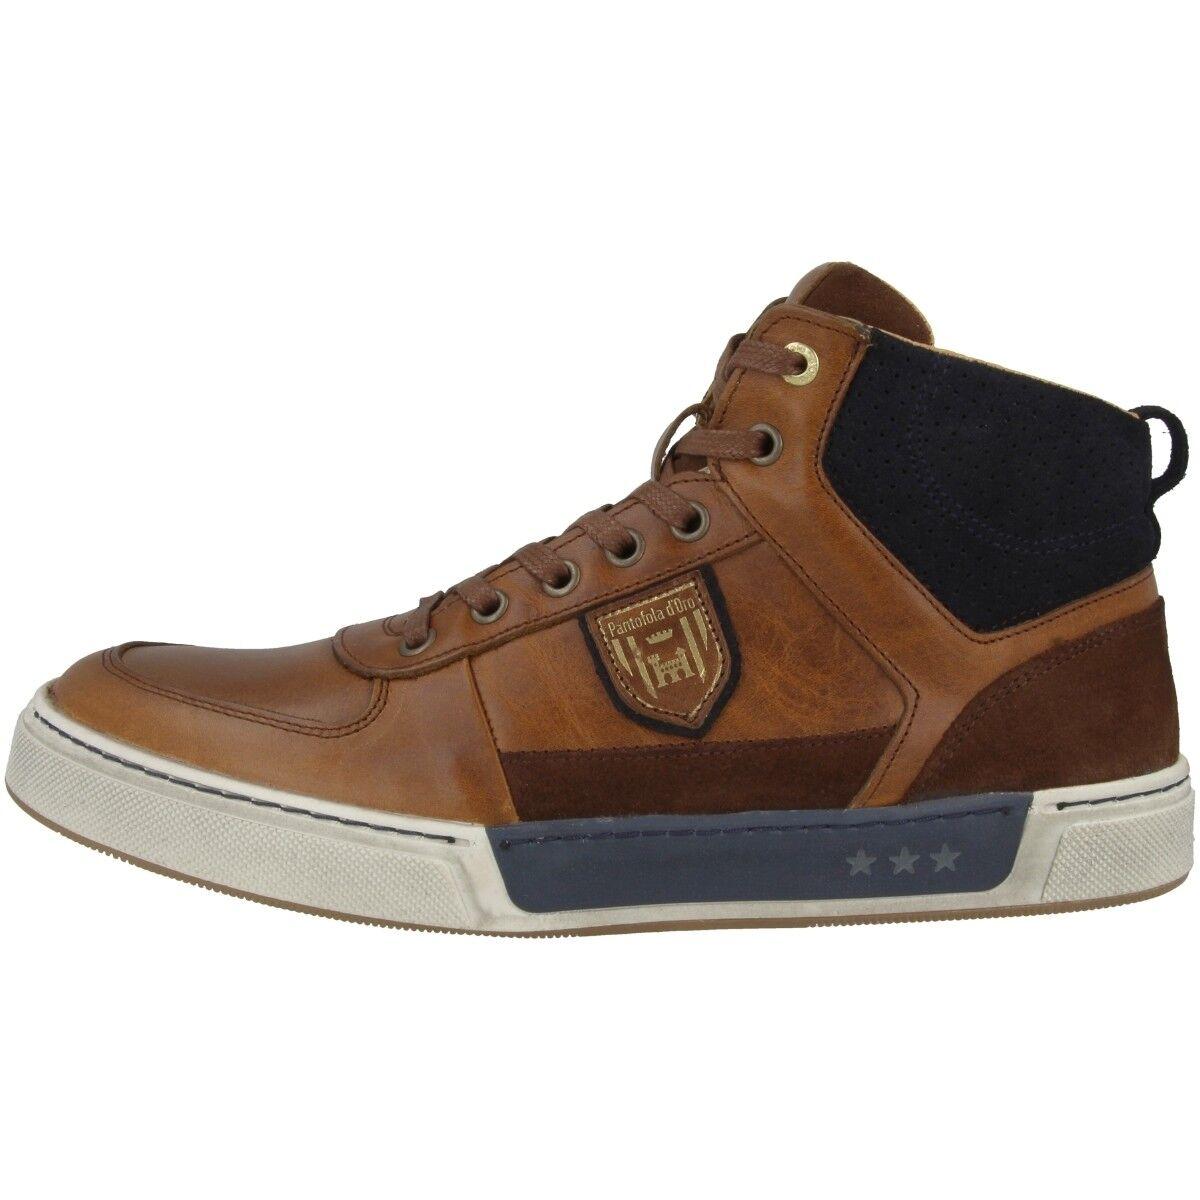 Pantofola D gold Frederico men Mid shoes da Ginnastica Alte Shell 10183023.JCU